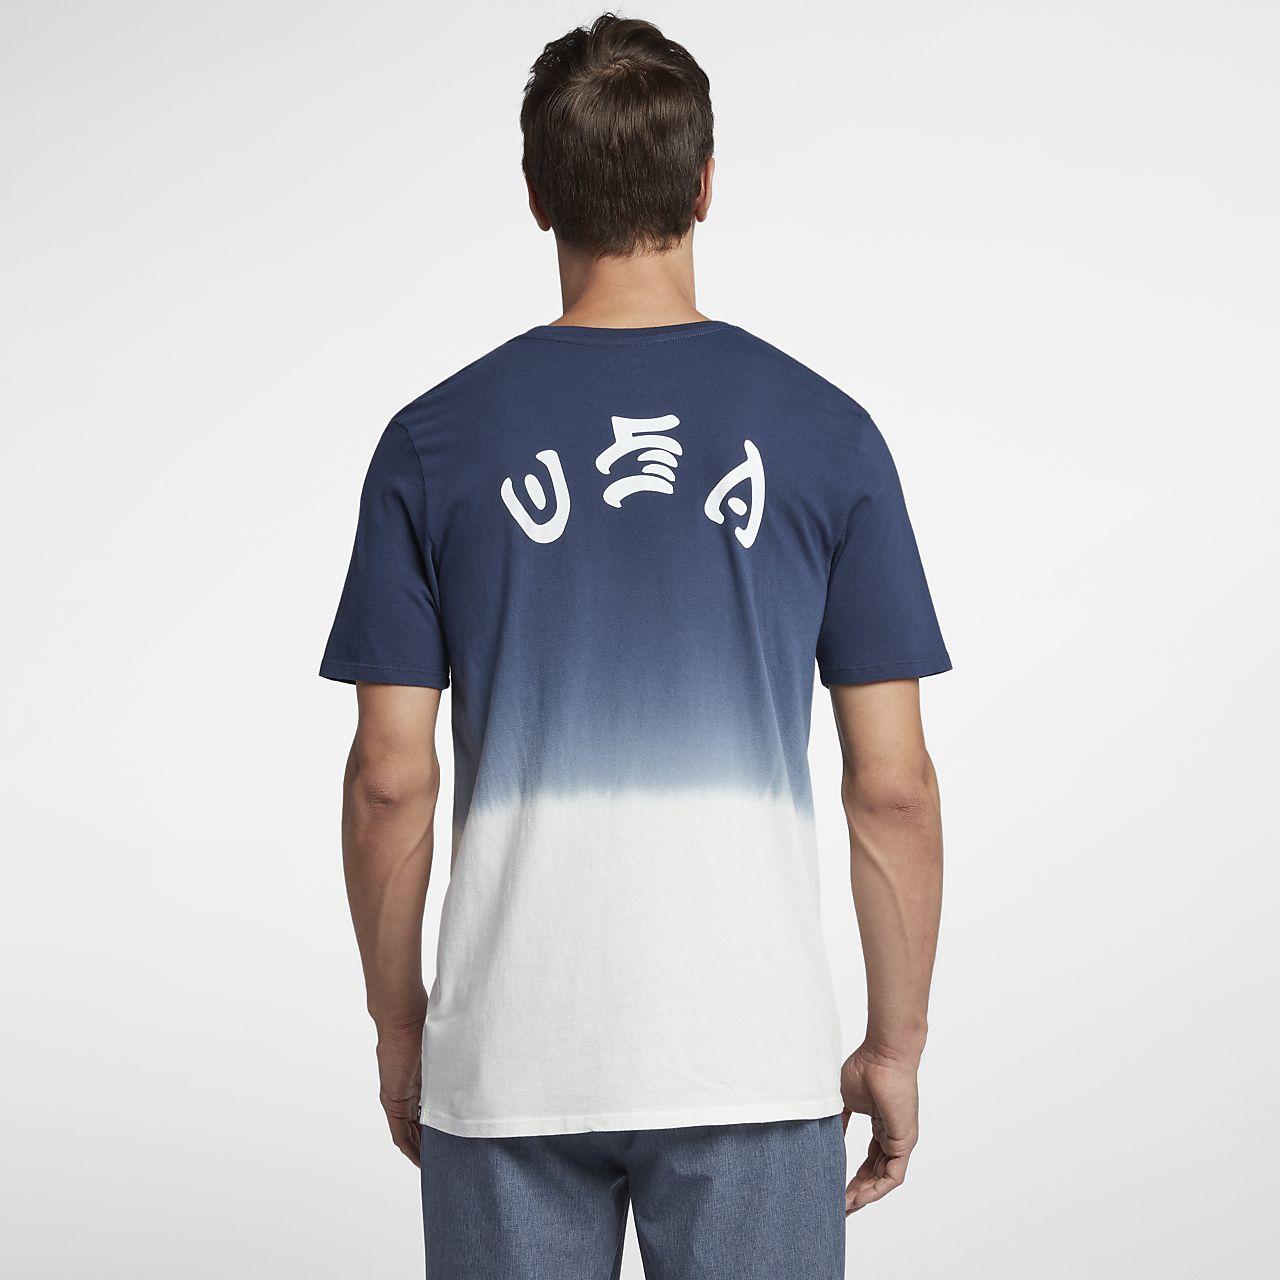 Nike Team Usa T Shirt | AGBU Hye Geen